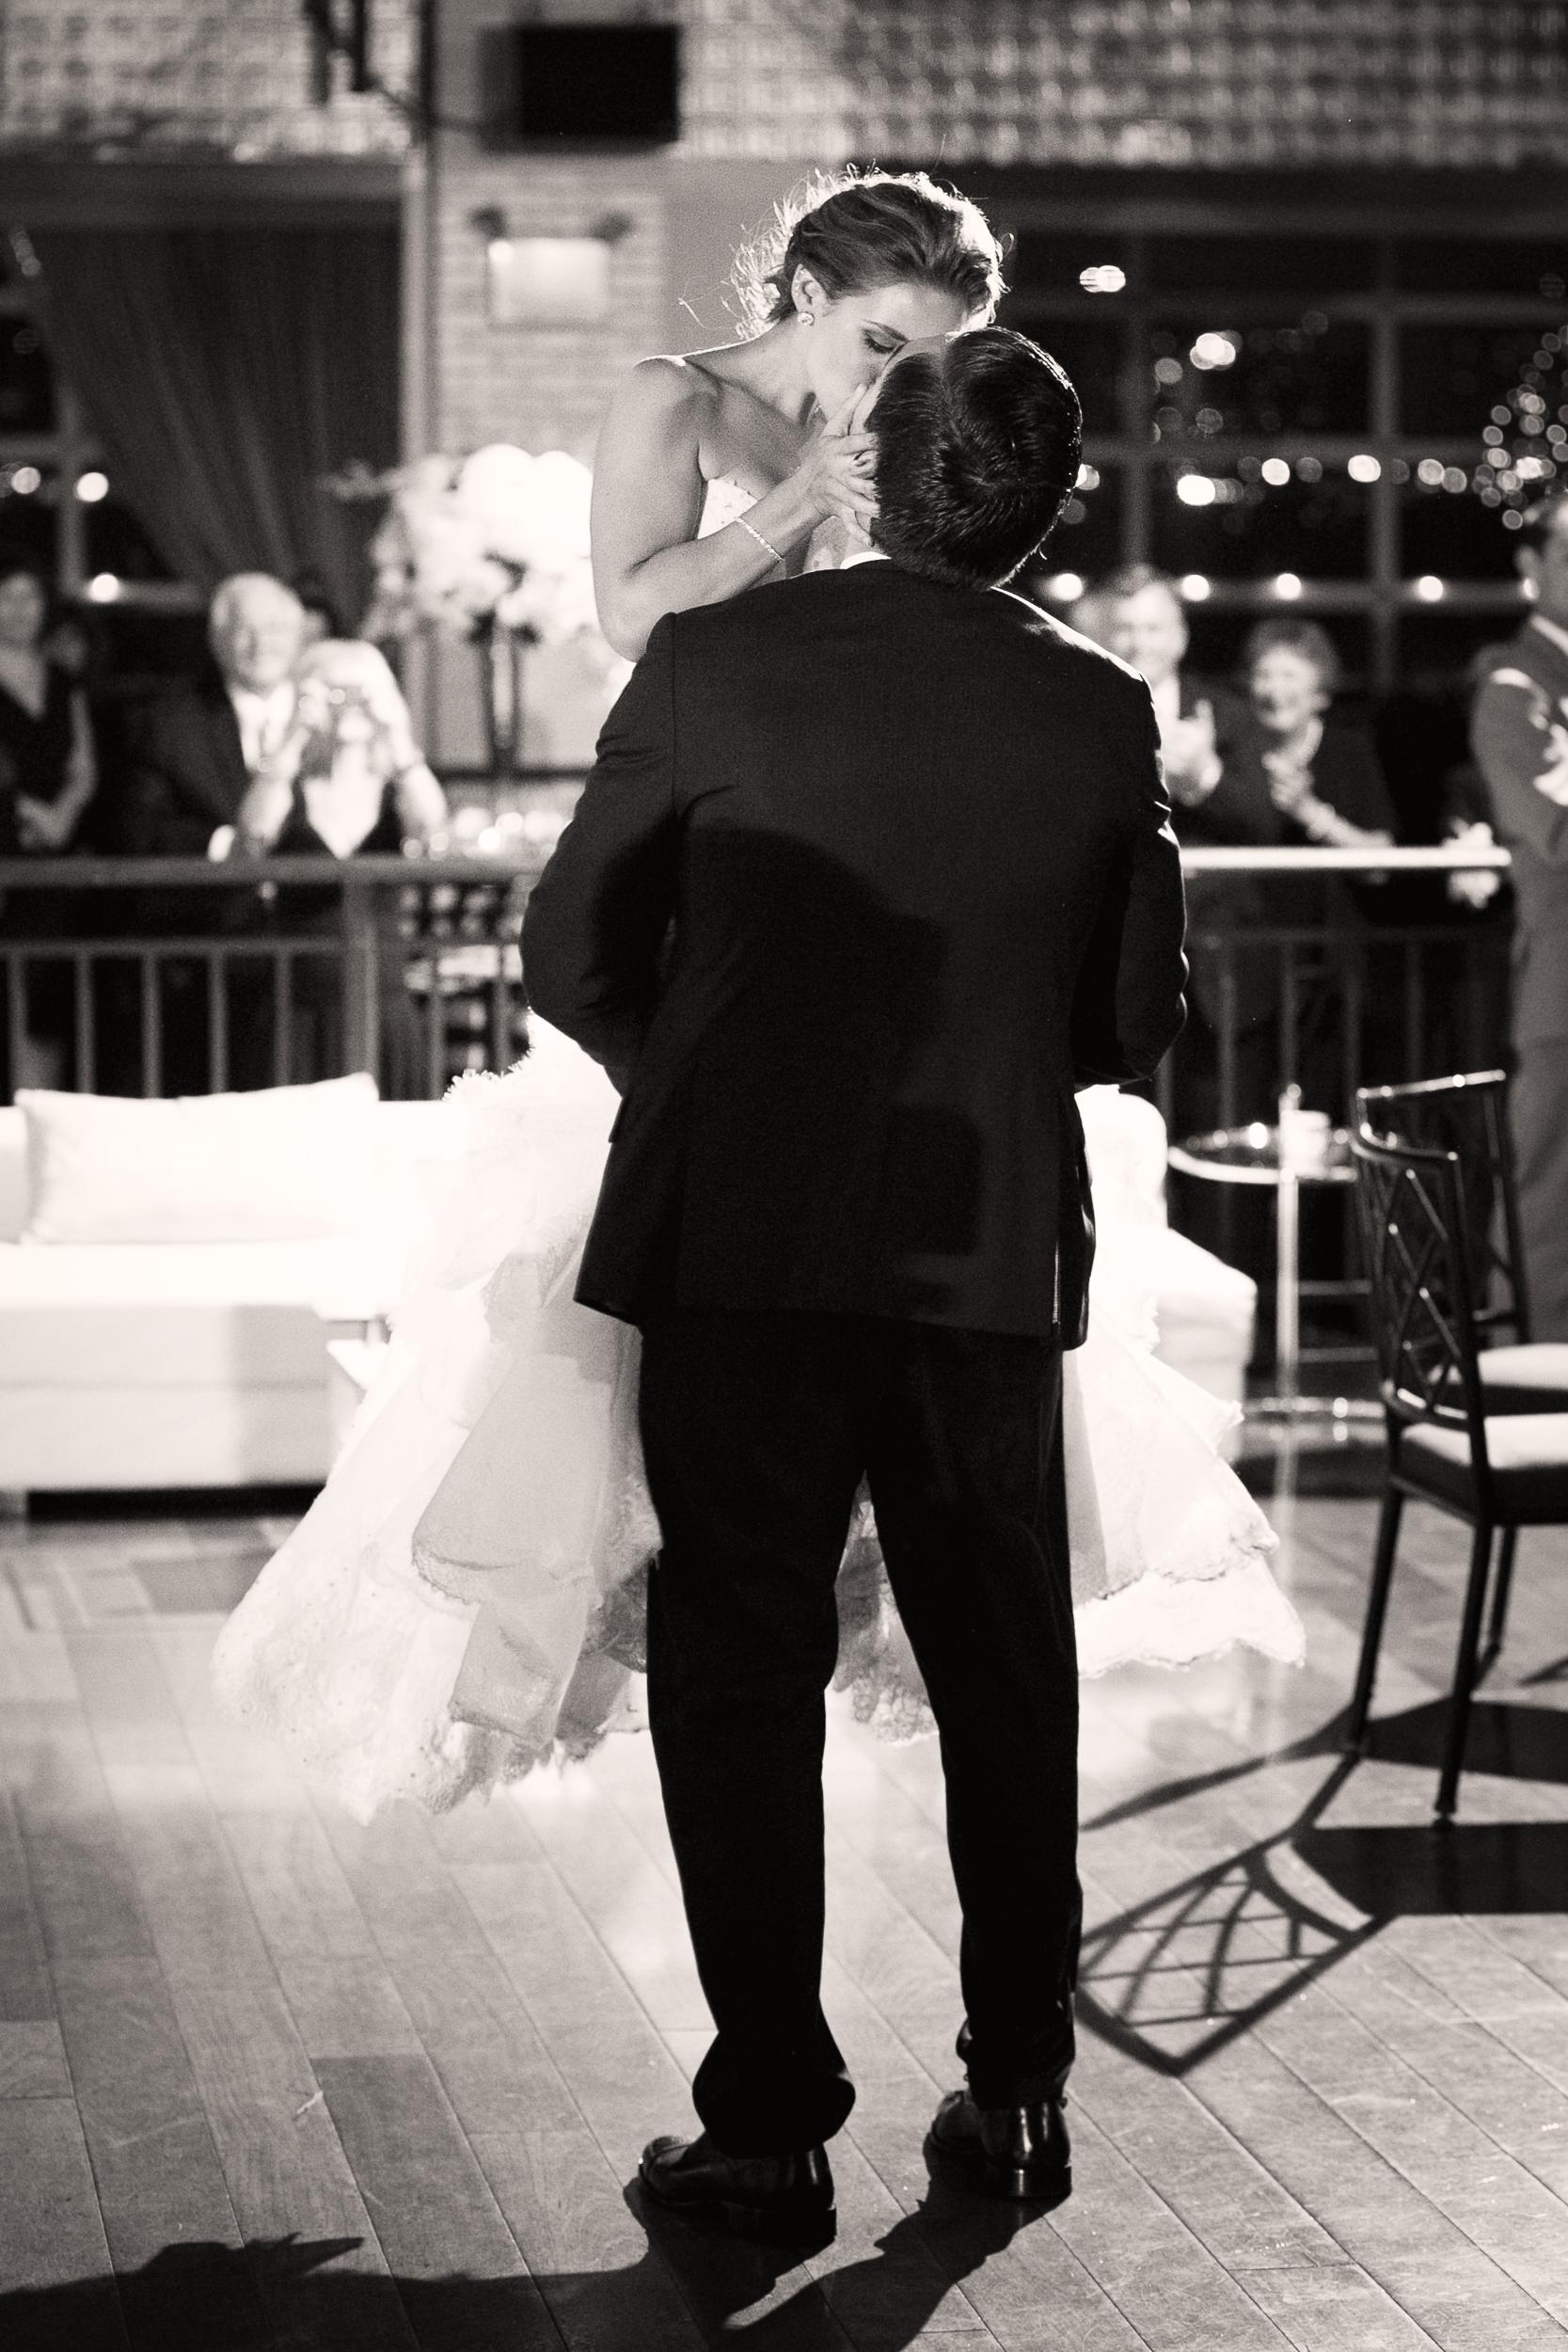 Ceci_New_York_Style_Luxury_Custom_Summer_Wedding_CeciBride_Letterpress_NewYork_Foil_Lighthouse_Chelsea_Piers_73.jpg